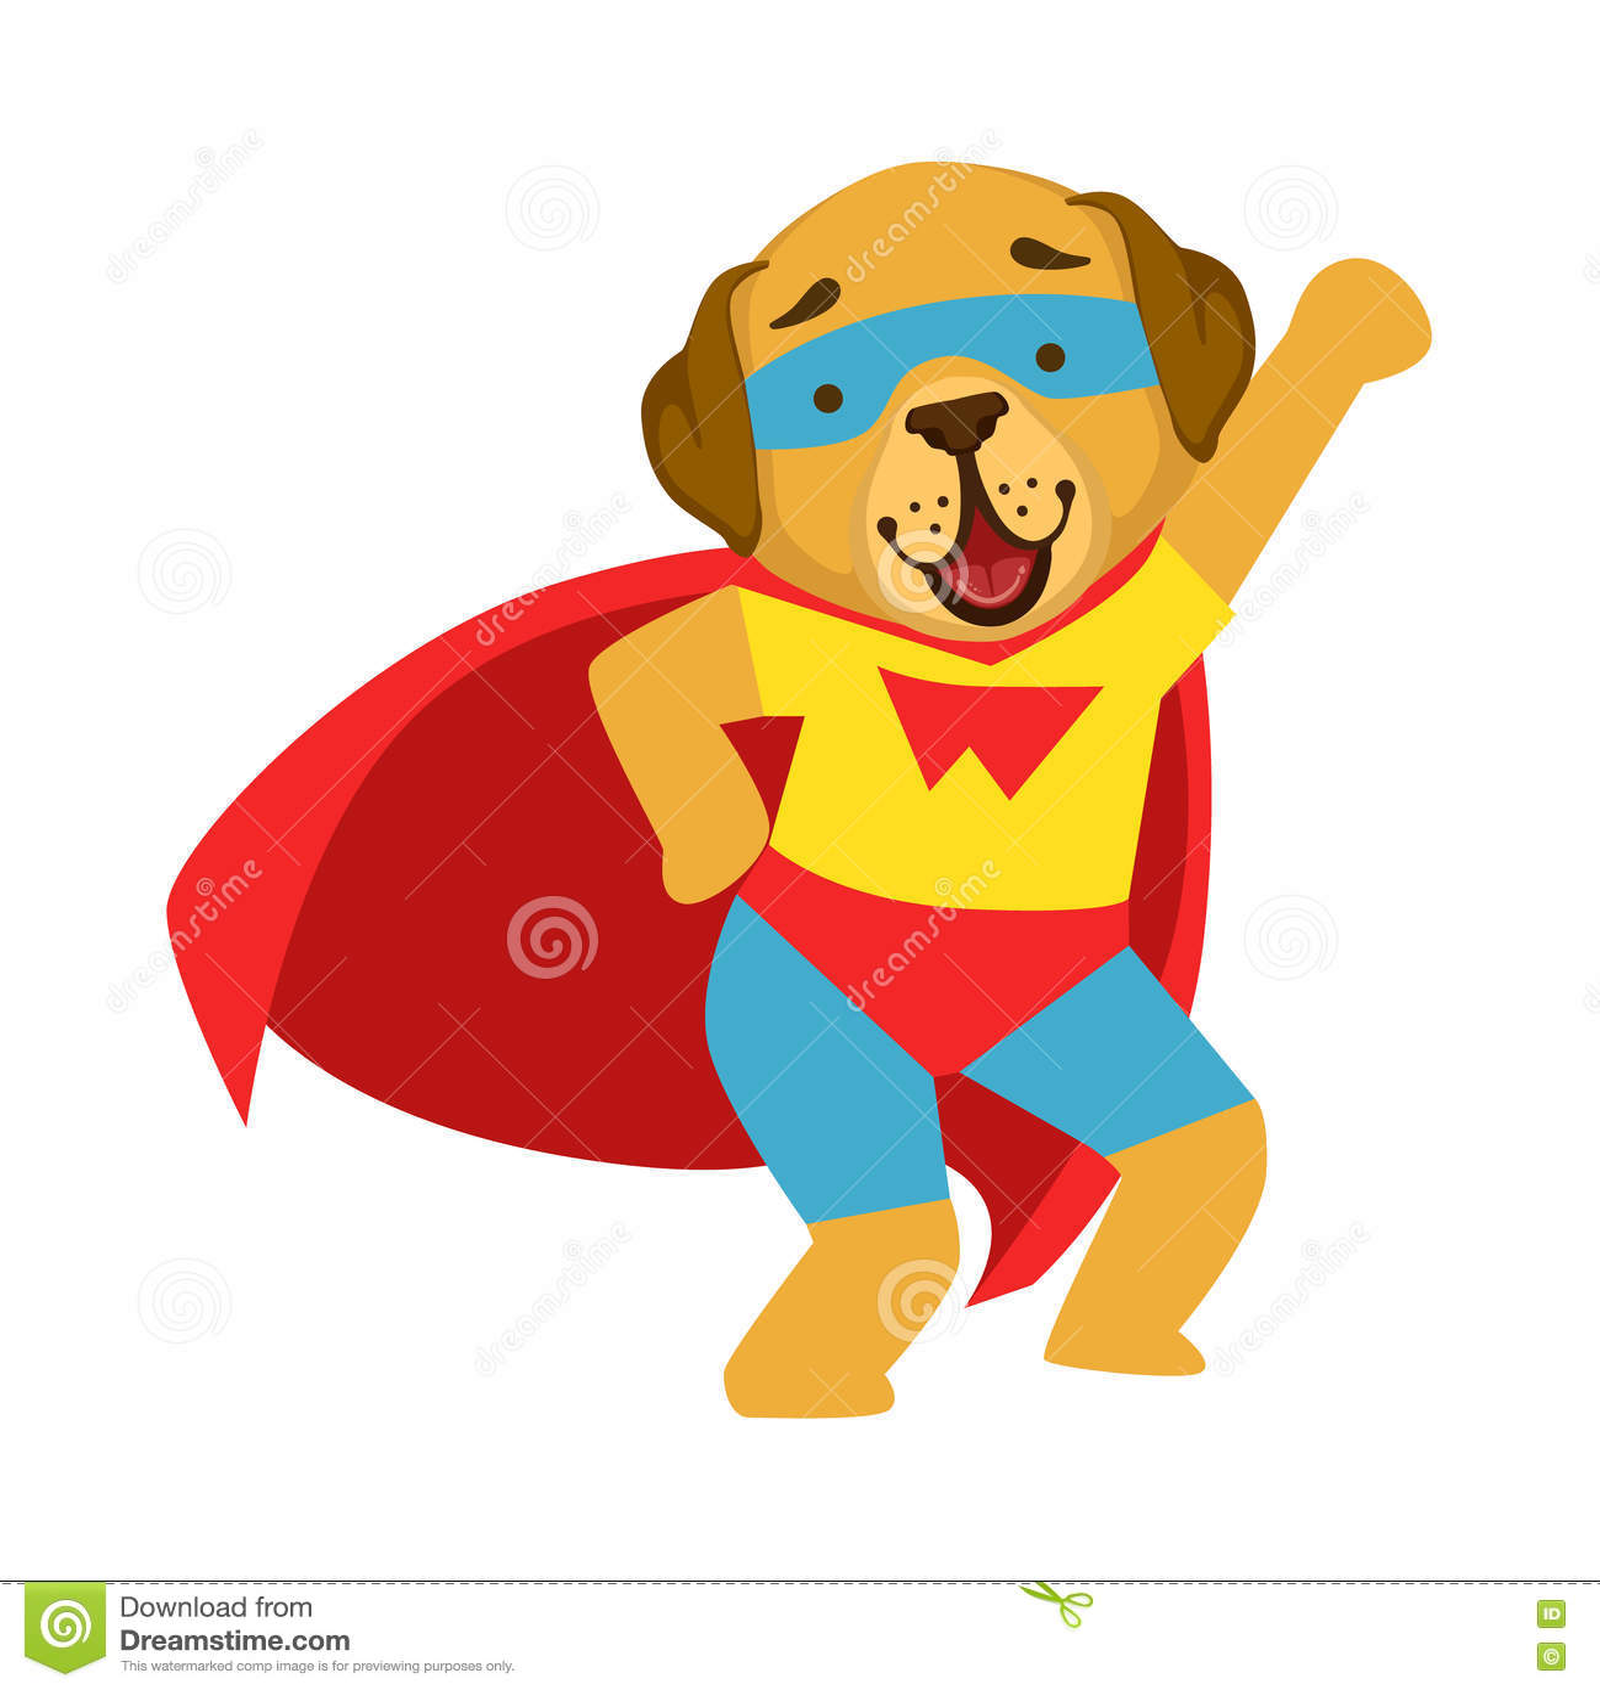 Dog Animal Dressed As Superhero With A Cape Comic Masked